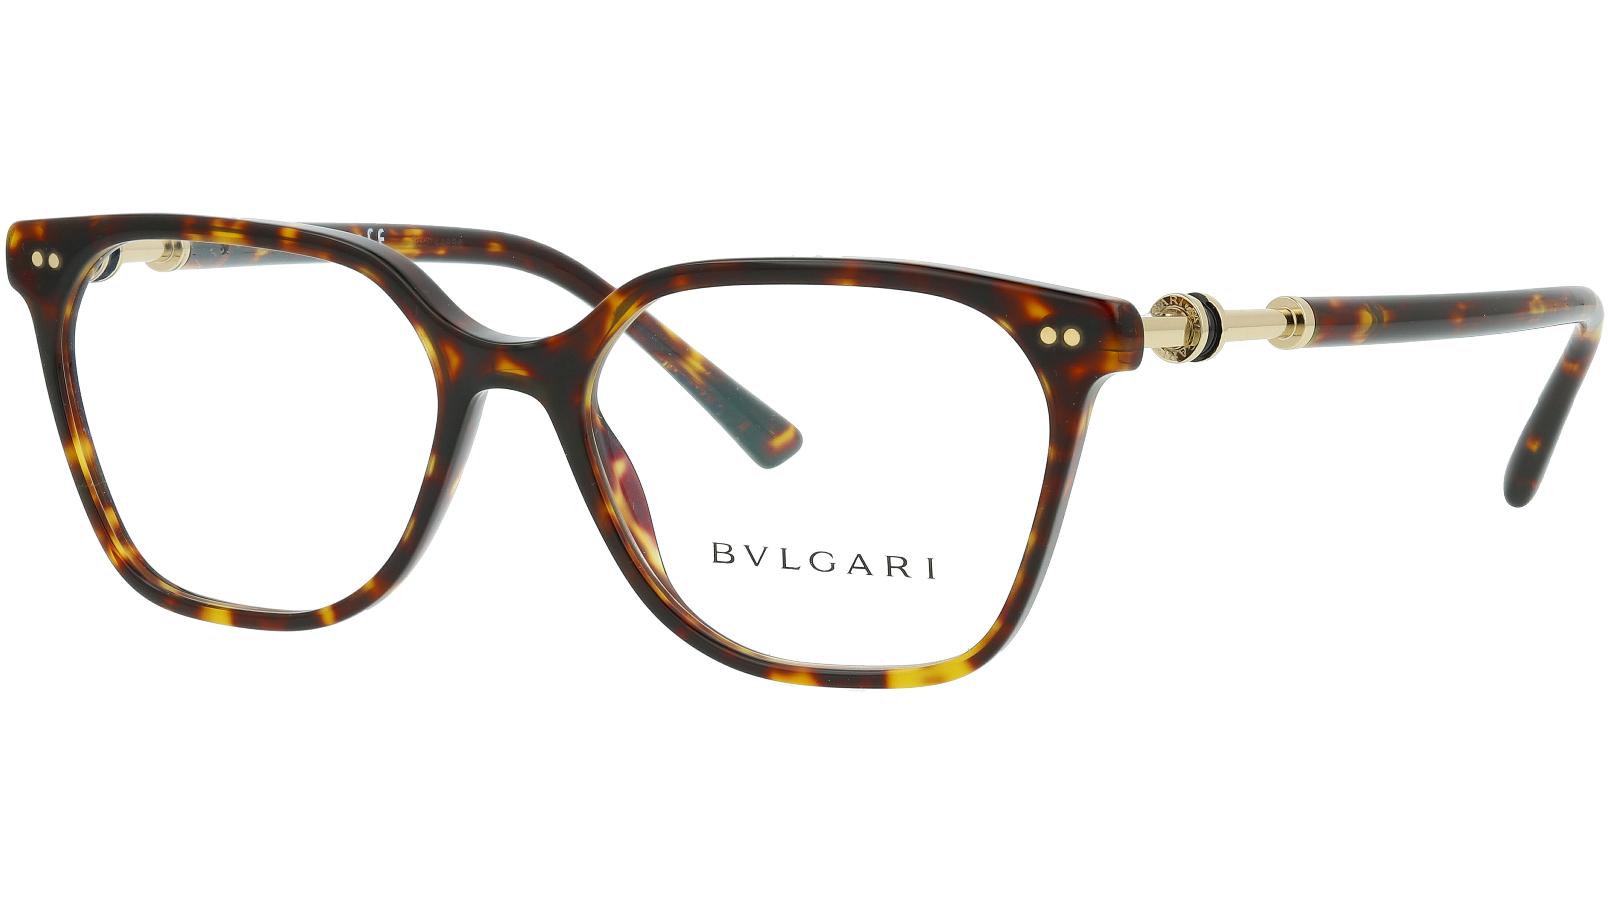 BVLGARI BV4178 504 53 HAVANA Glasses